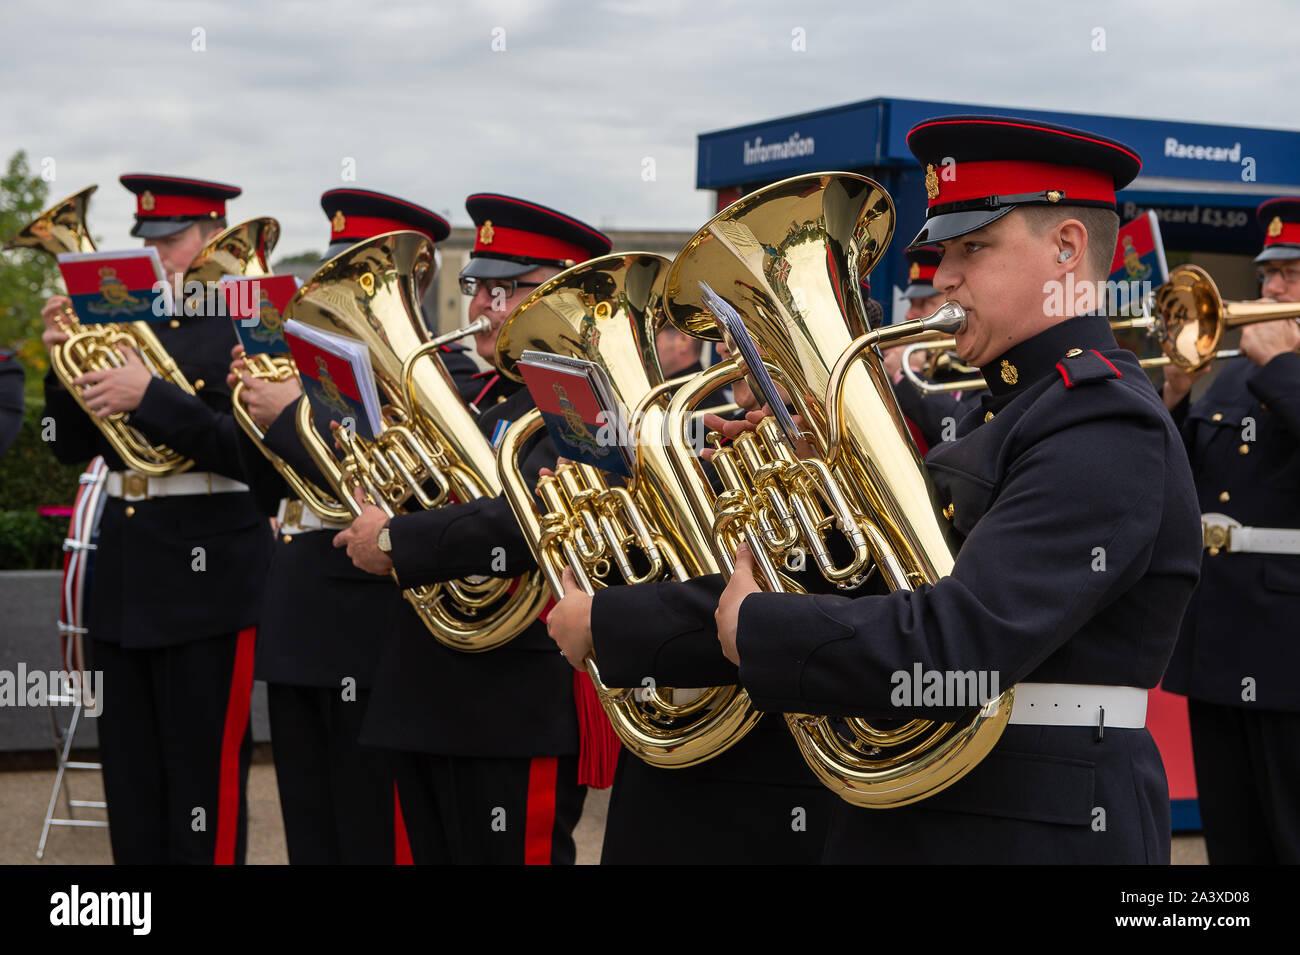 Autumn Racing Weekend & Ascot Beer Festival, Ascot Racecourse, Ascot, Berkshire, UK. 5th October, 2019. Tidworth Army Band play music for racegoers. Credit: Maureen McLean/Alamy Stock Photo